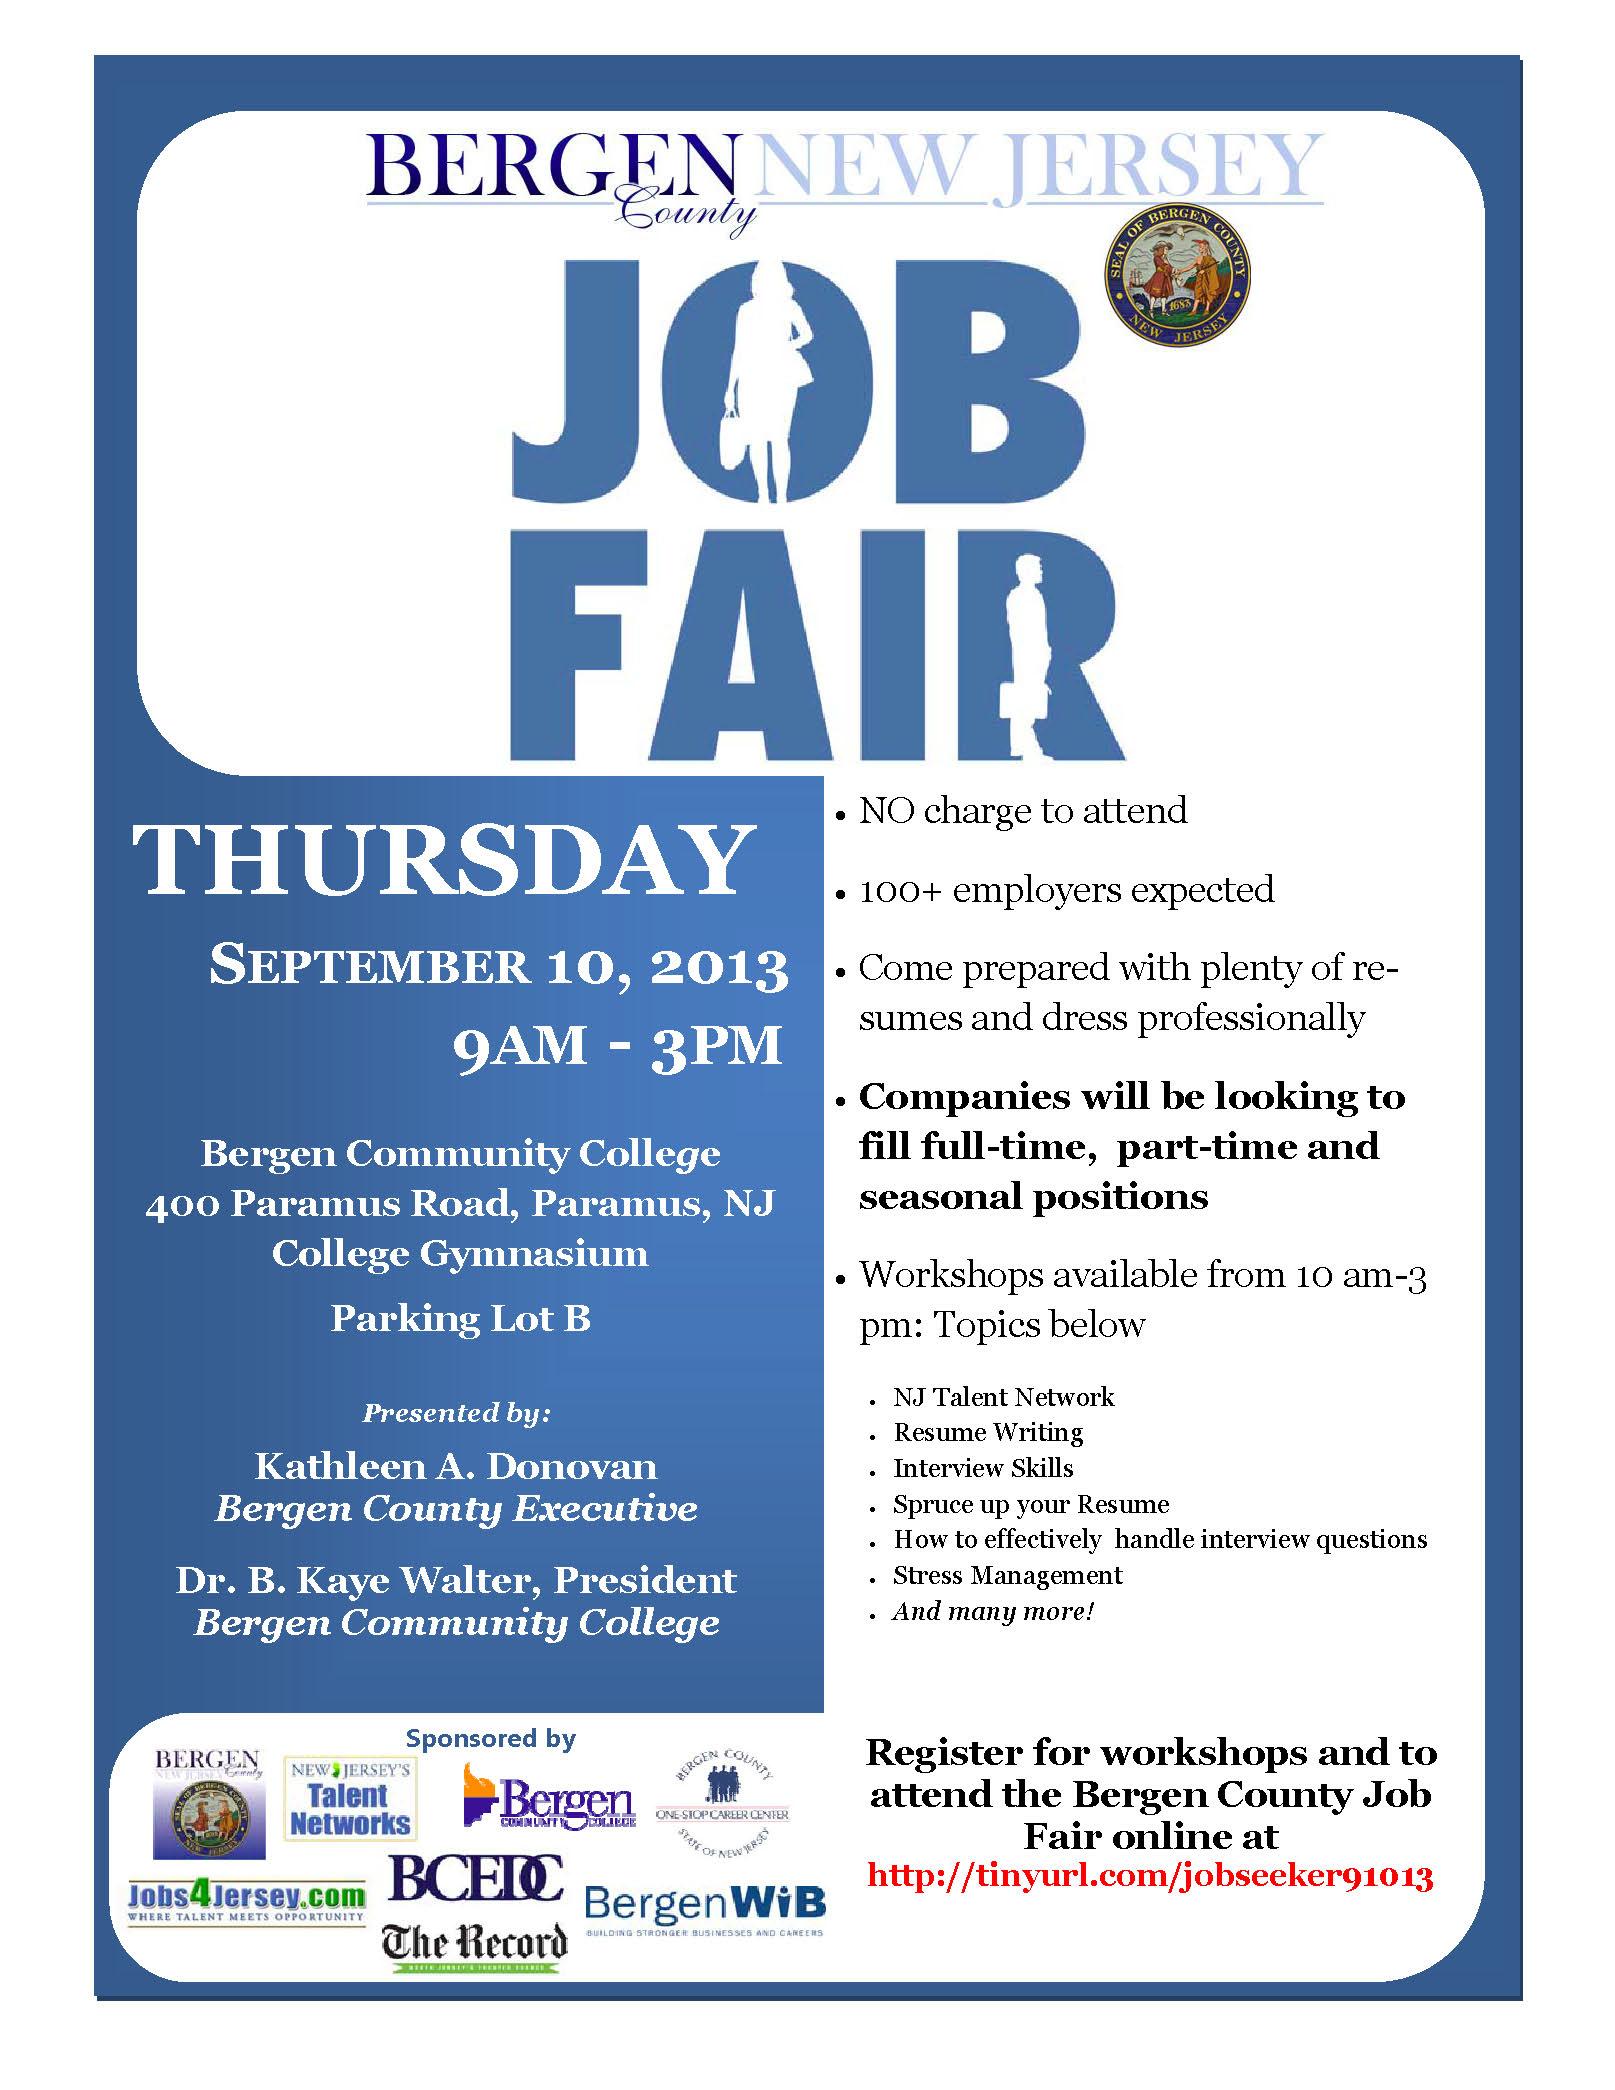 Blue apron job fair nj - Bergen County Job Fair September 10 Flyer Jpg 1615x2090 College Job Flyer